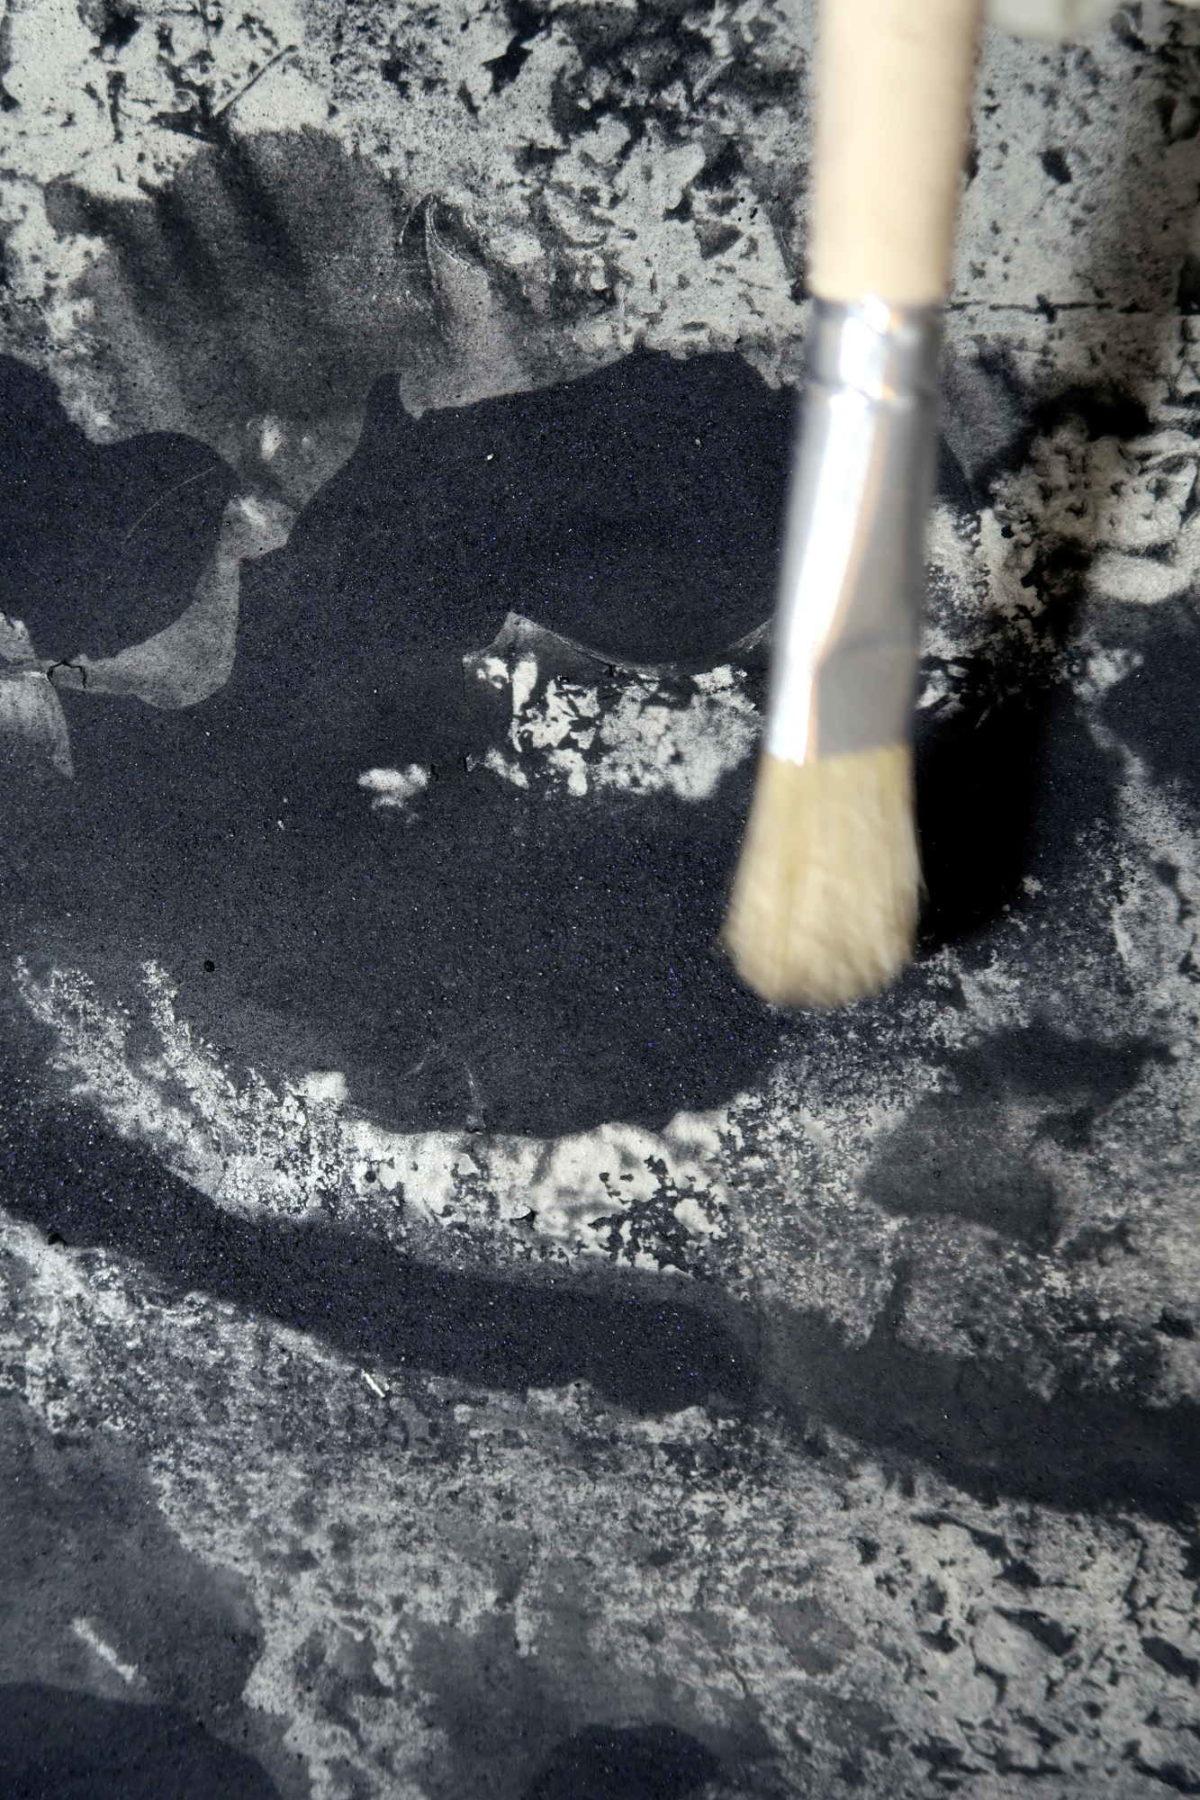 Cinque Terre artistic photography. Detail Sciacchetrà shadows.